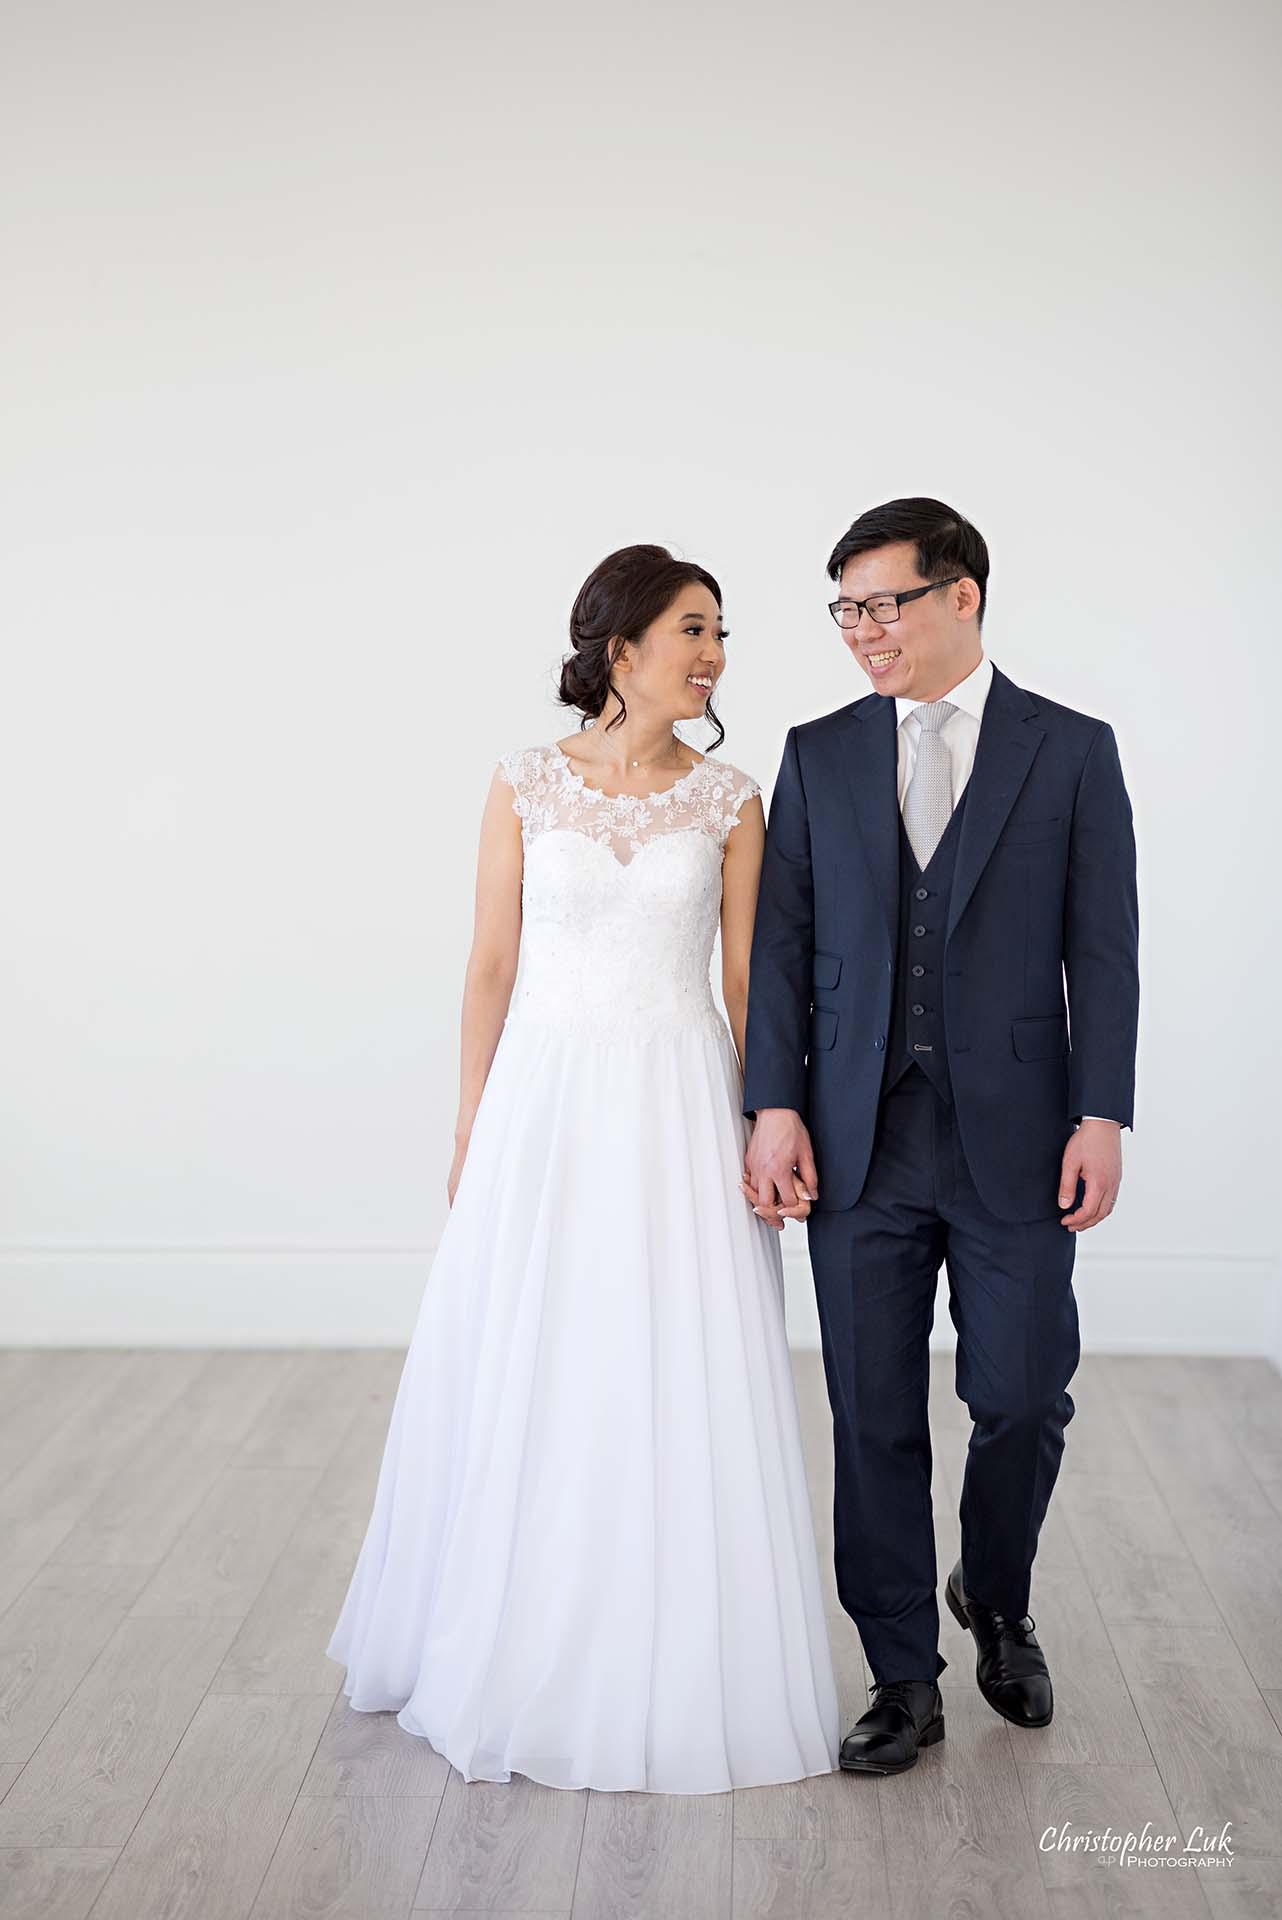 Christopher Luk Toronto Wedding Photographer - Mint Room Studios Bride Groom Natural Candid Photojournalistic Conservatory Ballroom Walking Together